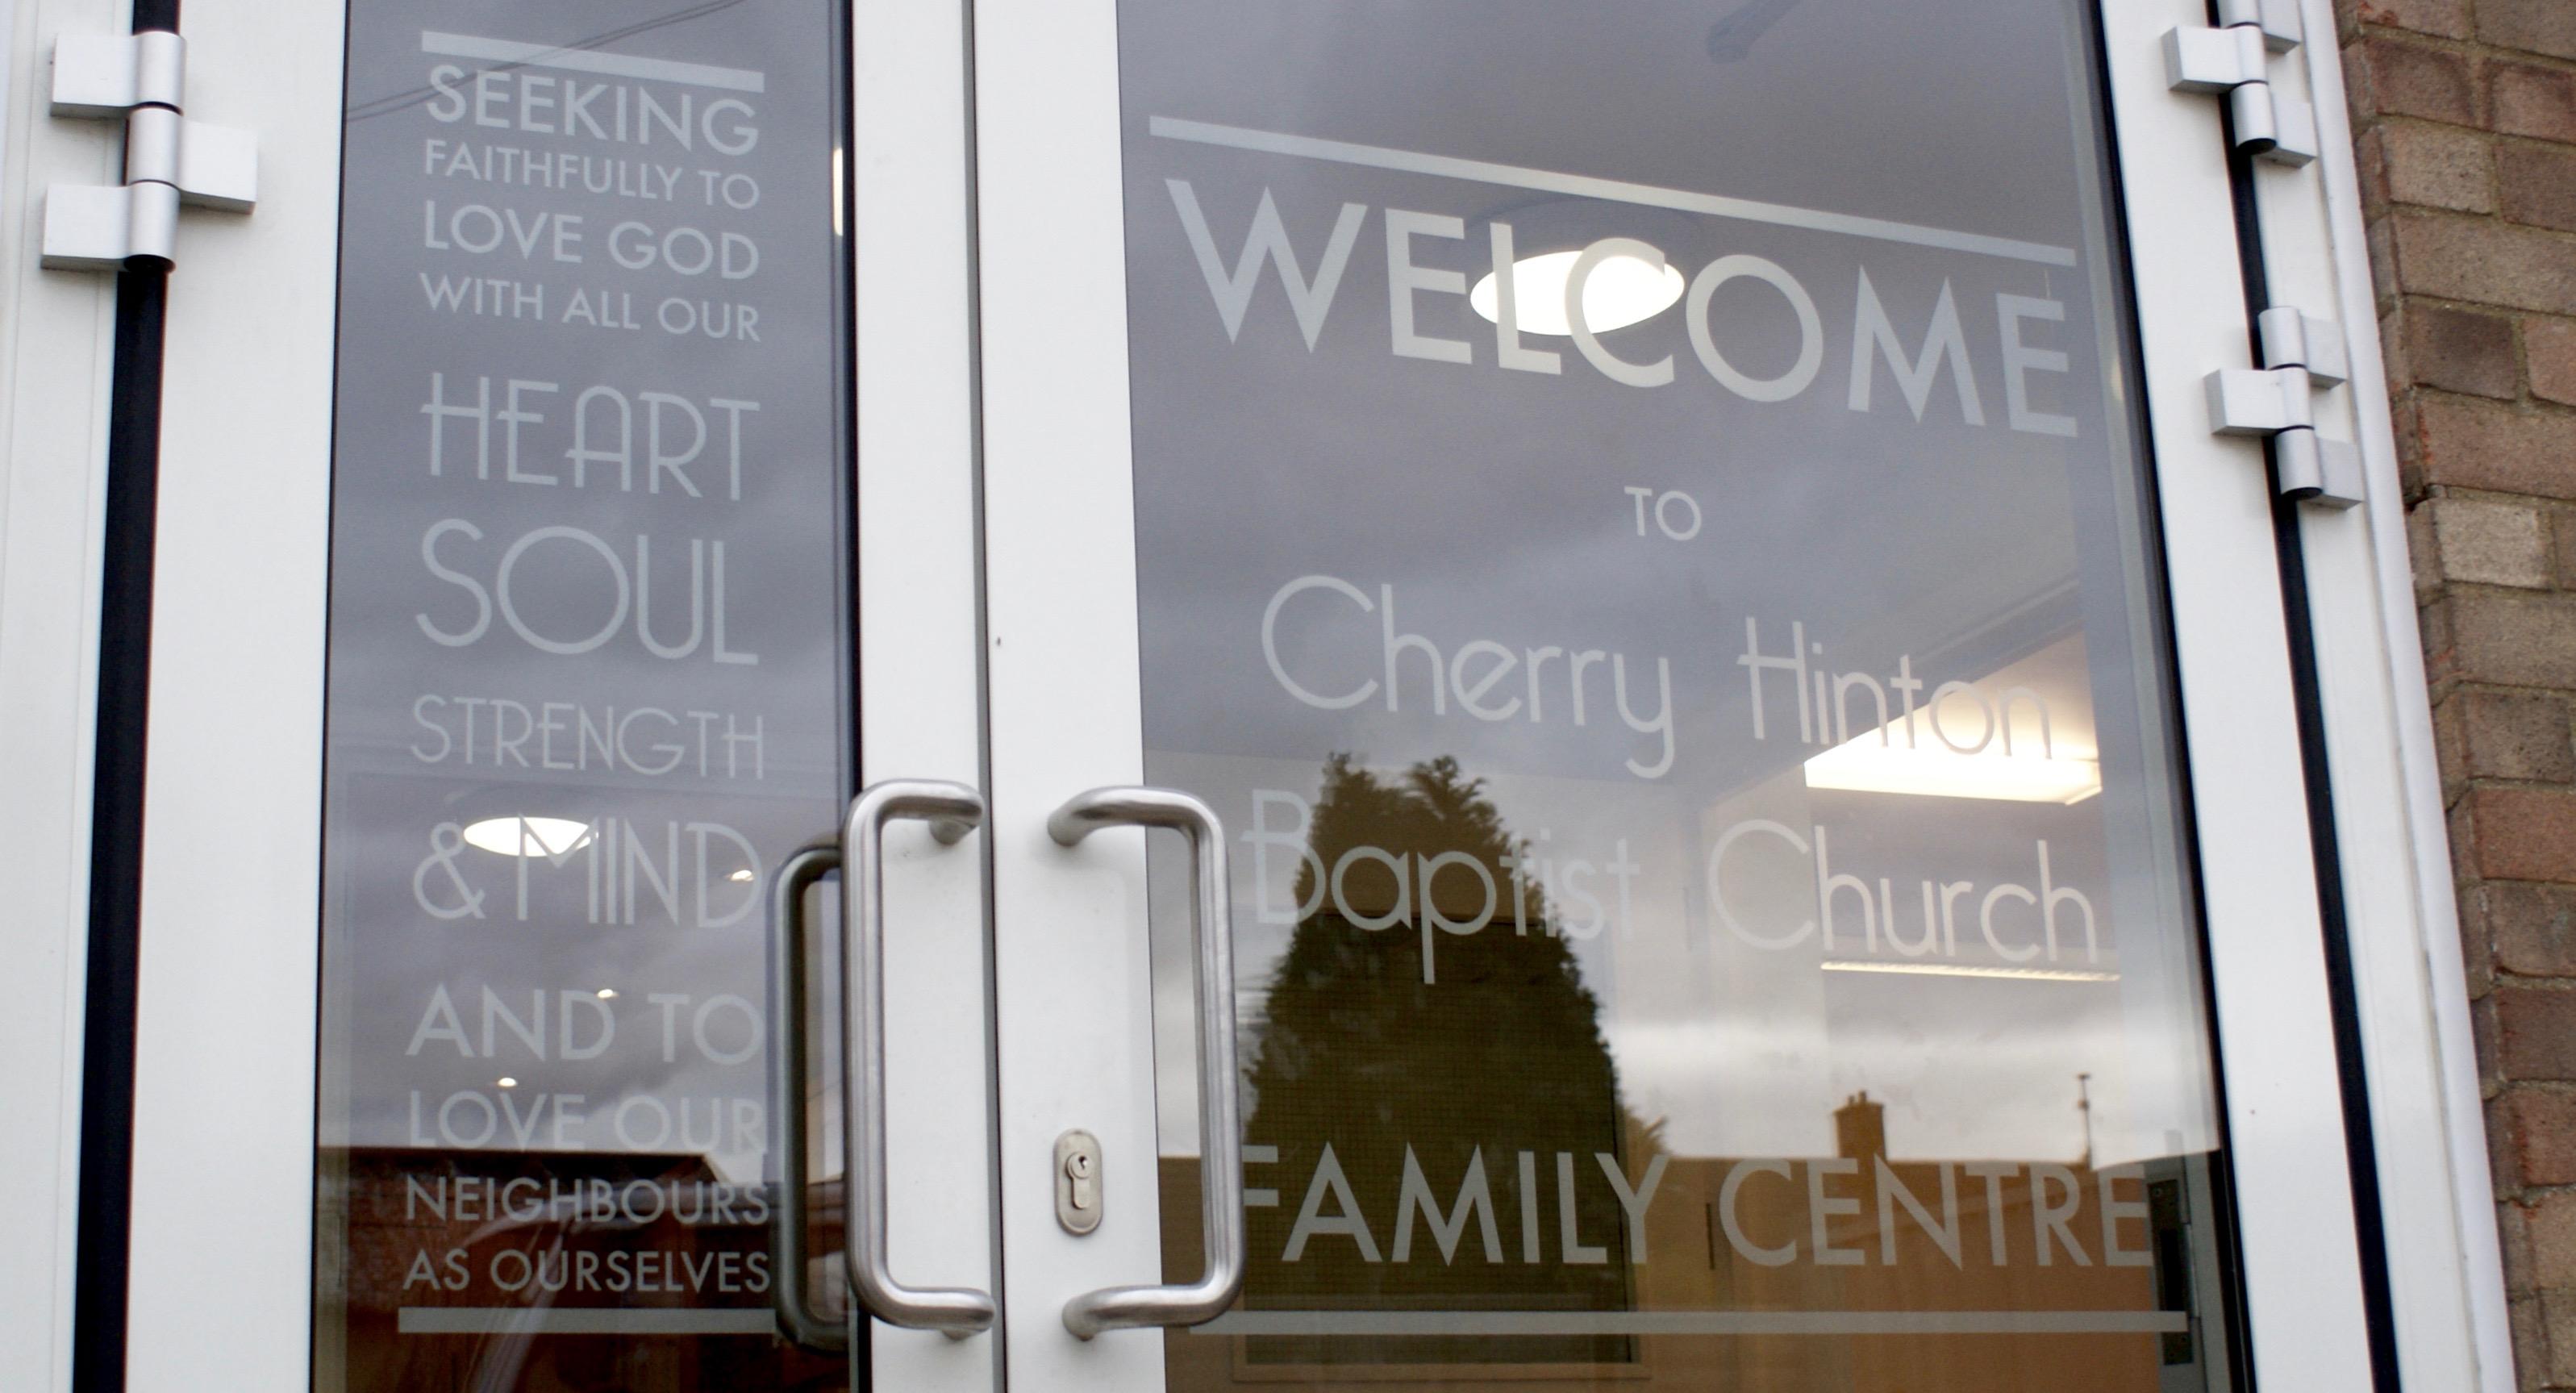 Cherry Hinton Family Centre doo